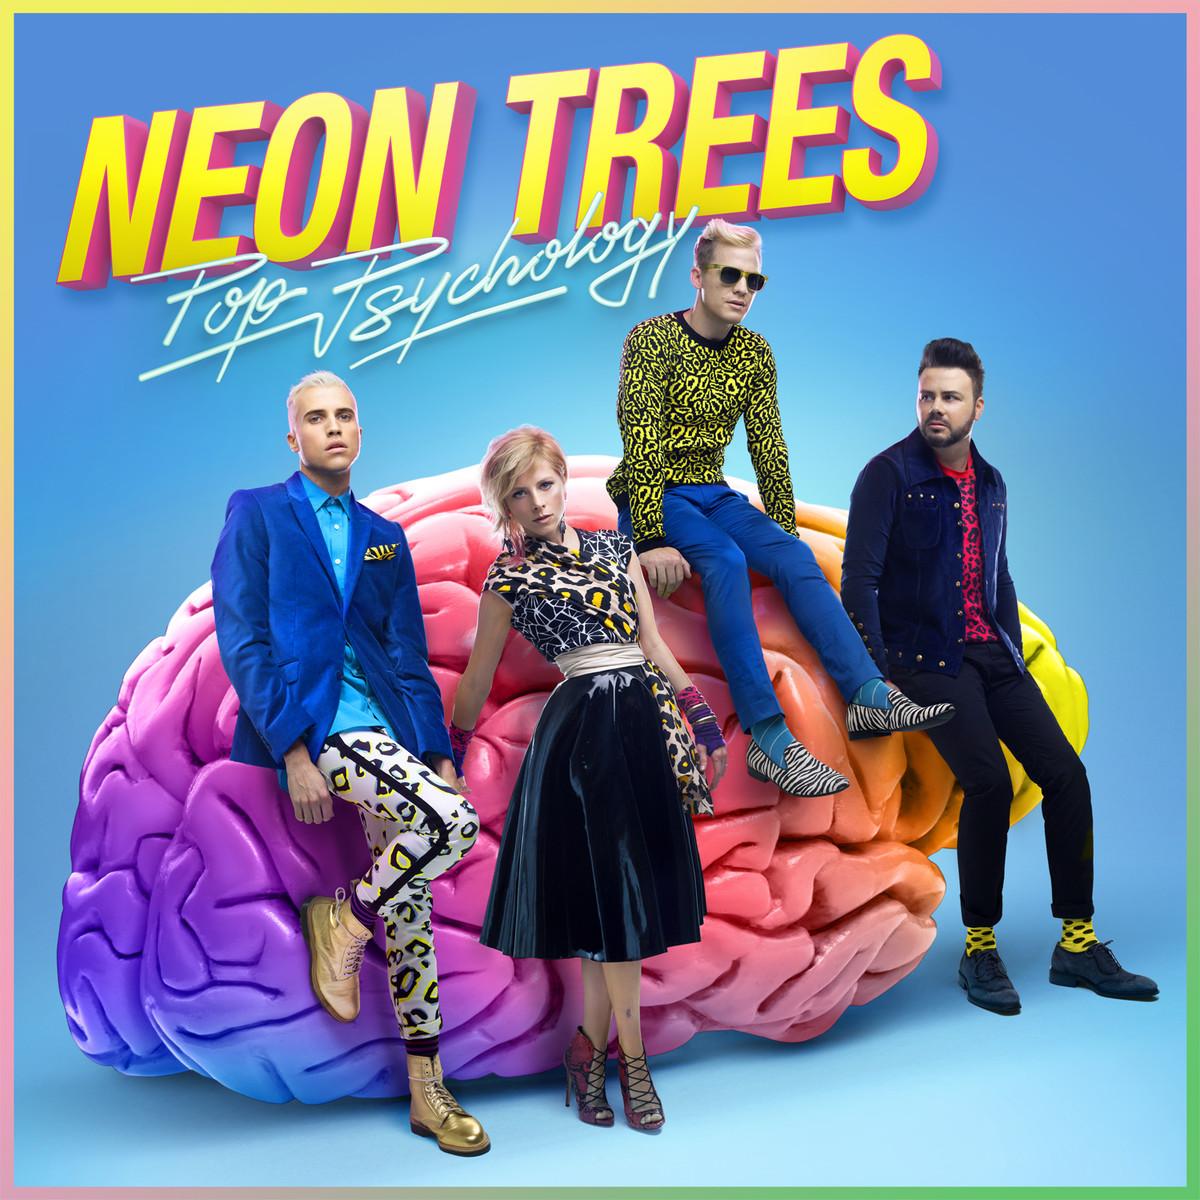 neon-trees-pop-psychology